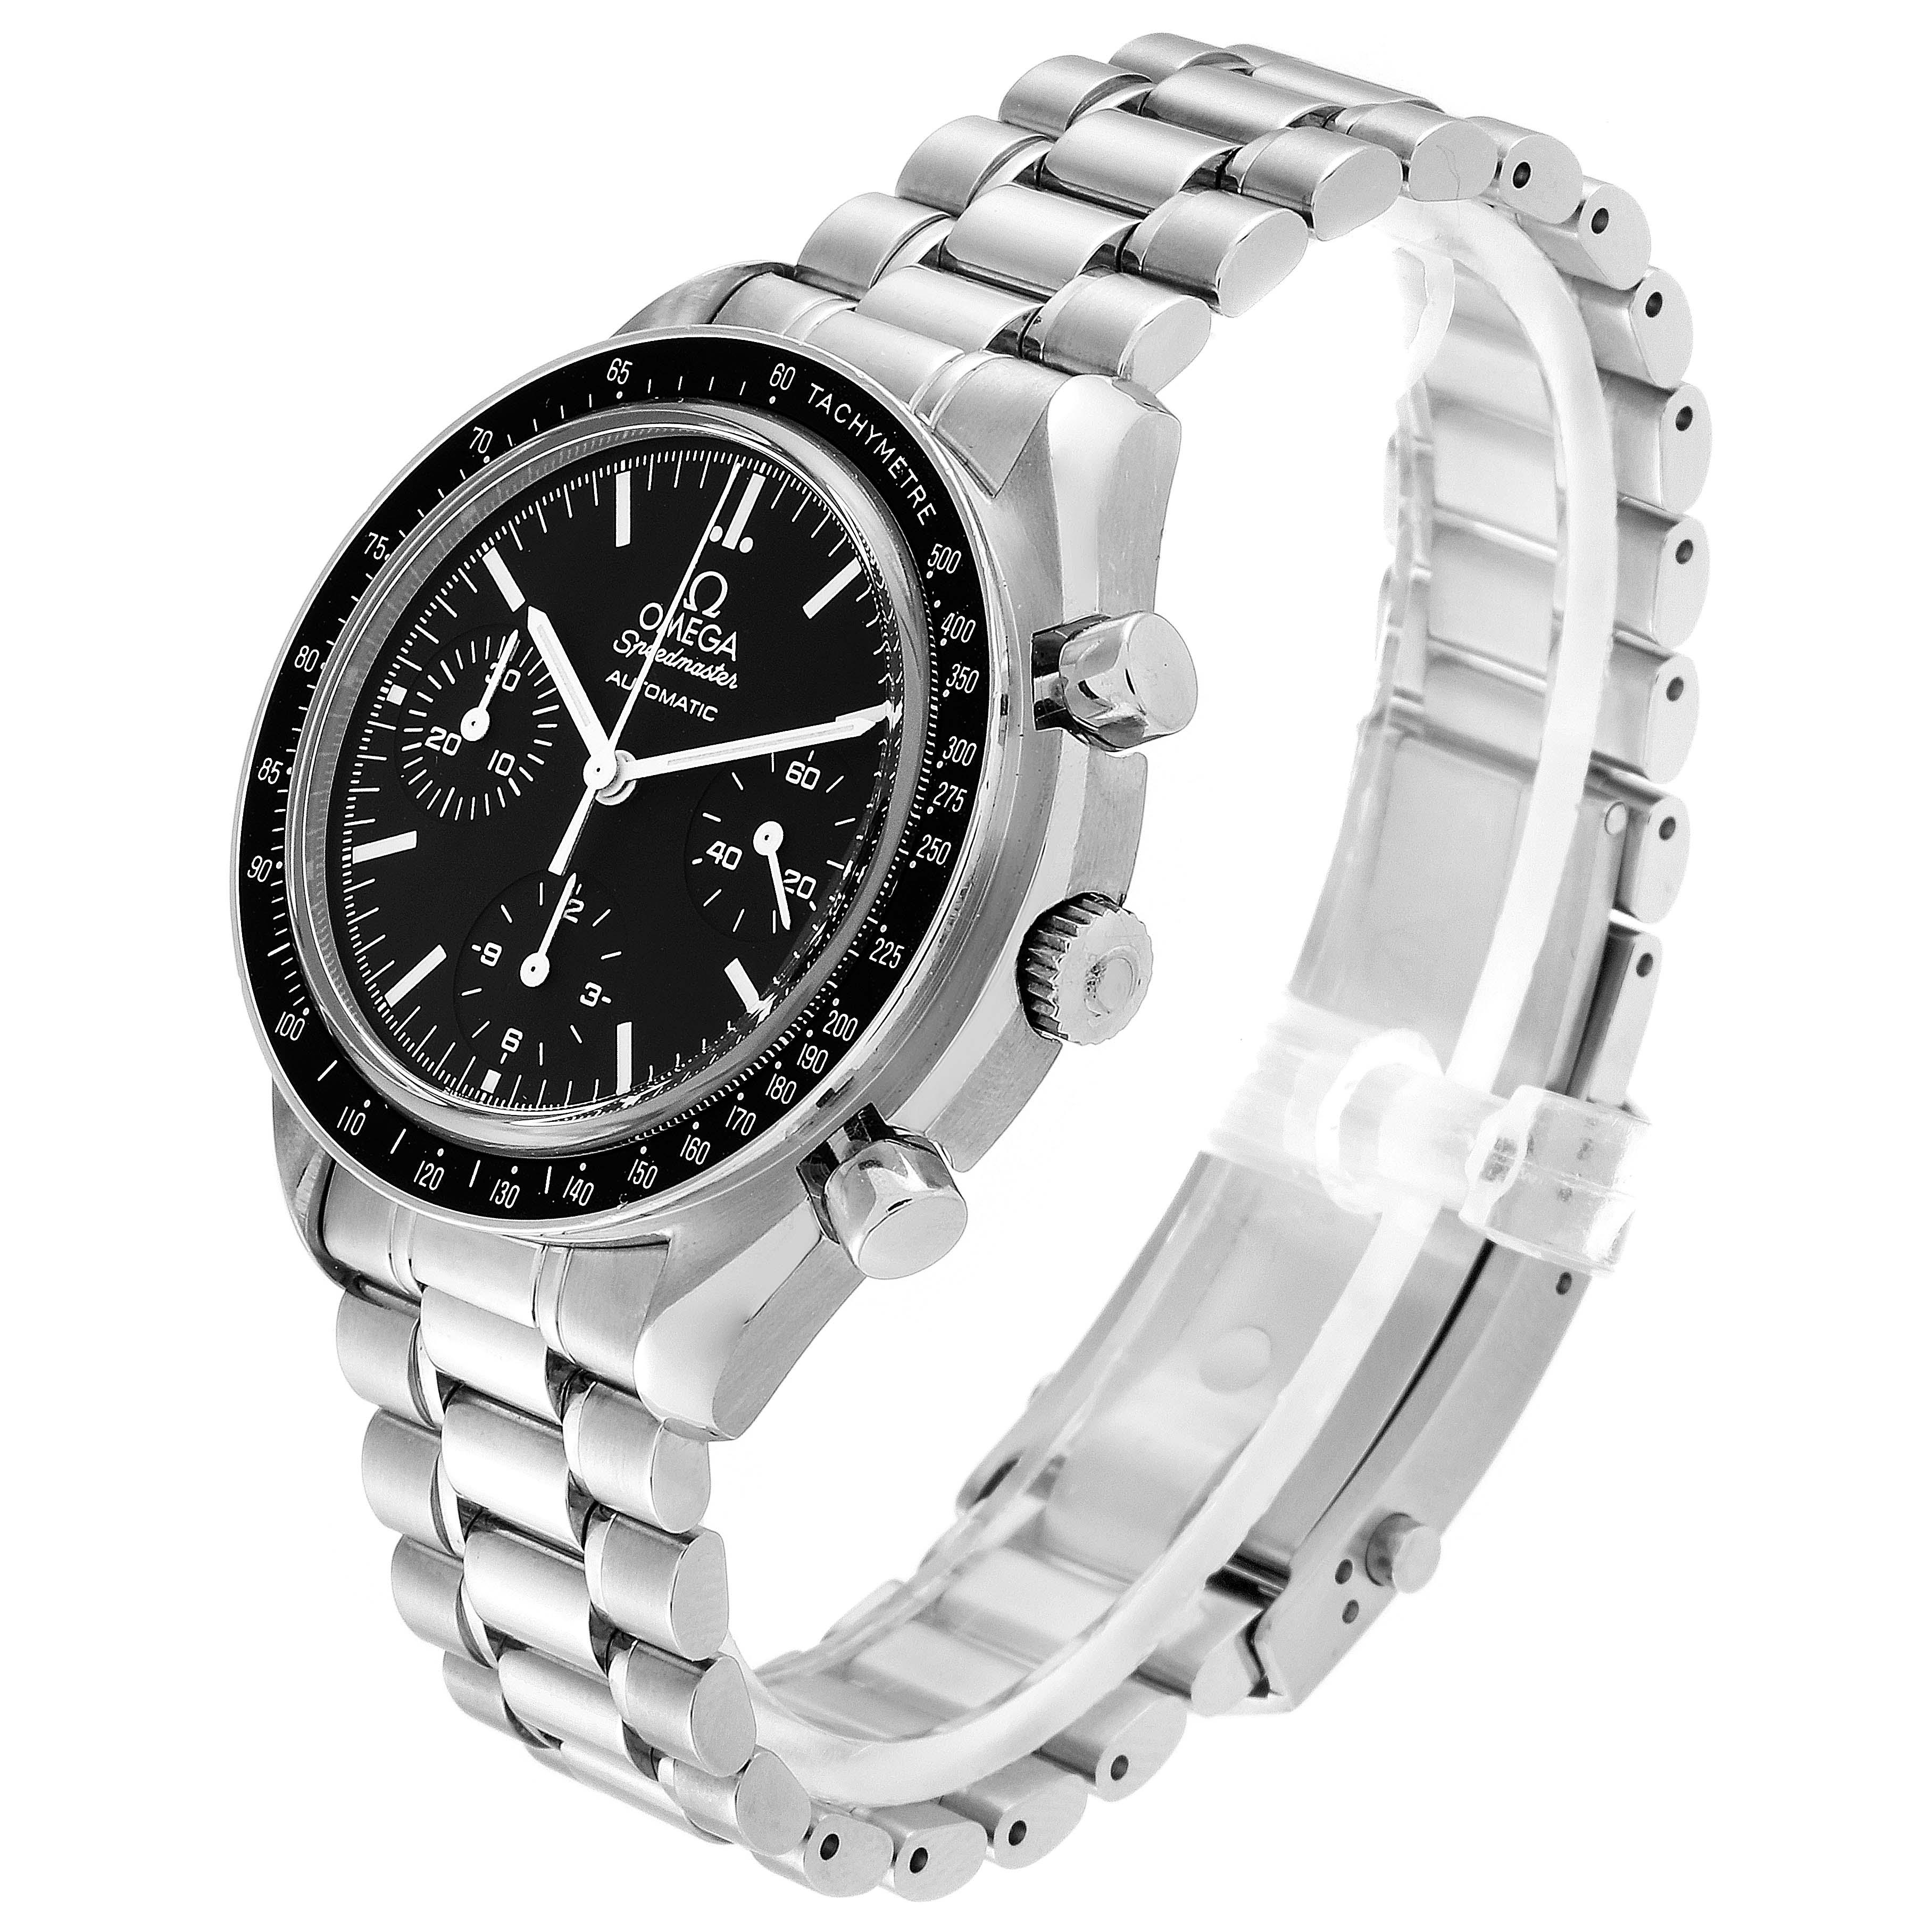 Omega Speedmaster Reduced Automatic Steel Watch 3539.50.00 Box Card SwissWatchExpo